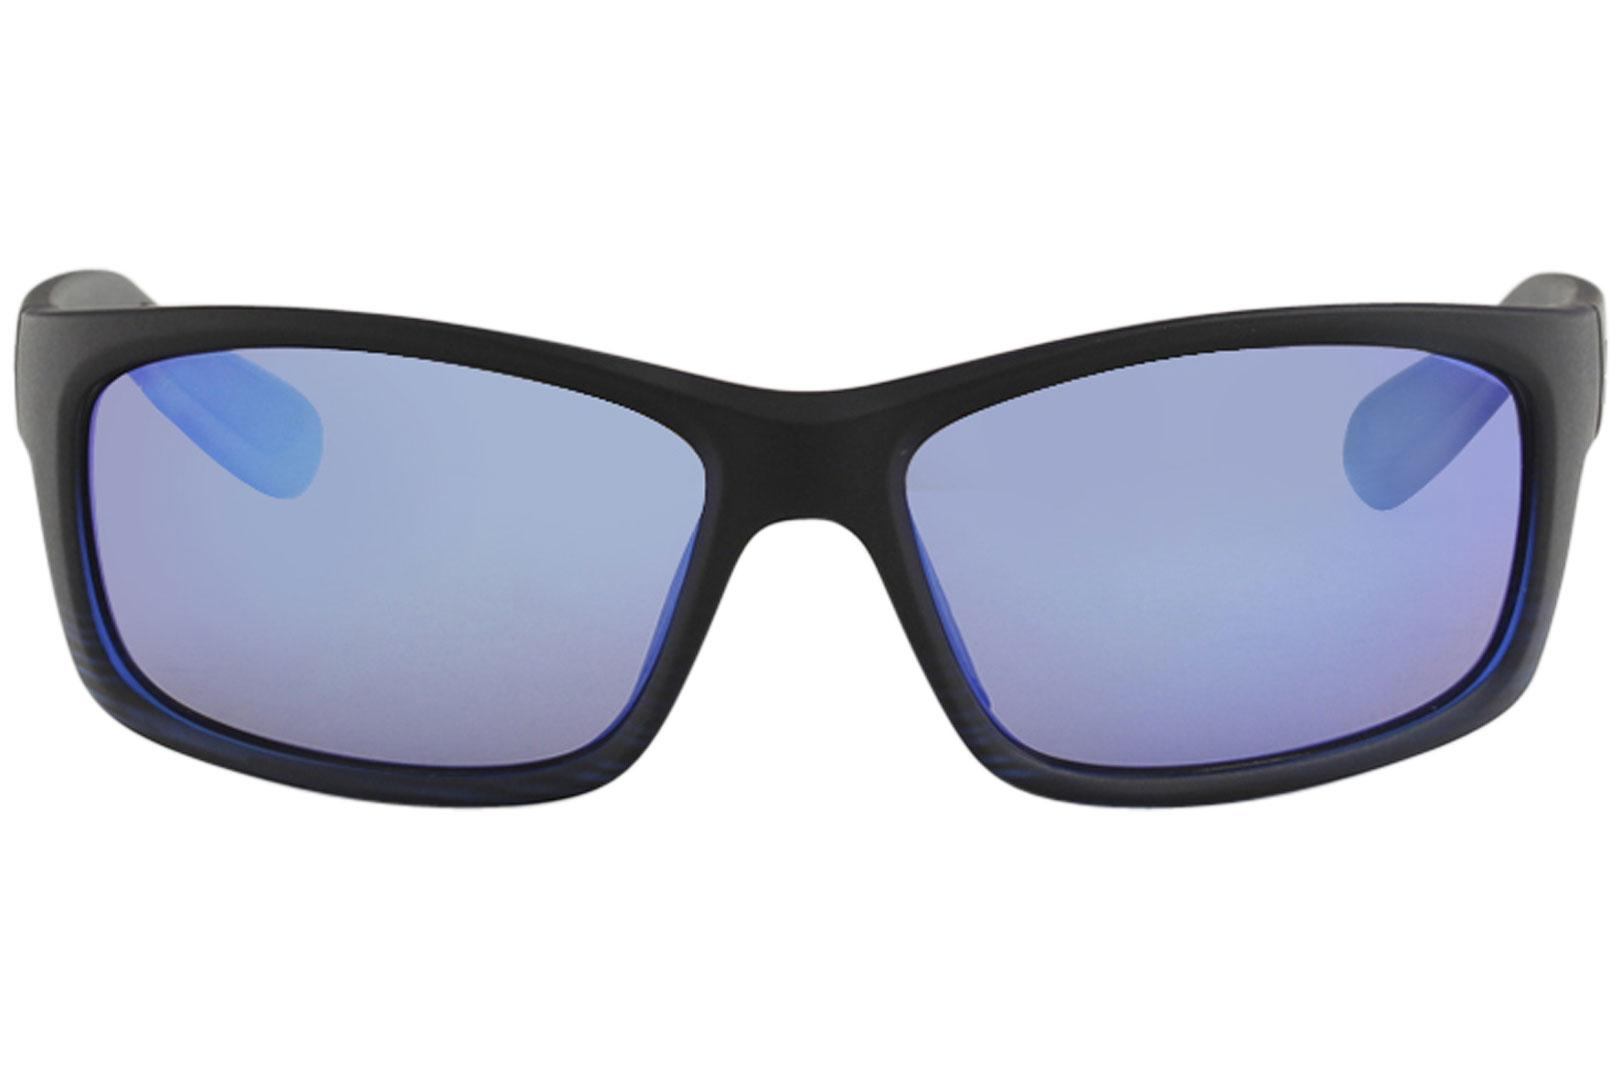 5321b57cd4 ... Kanaio-Coast MJ766 MJ 766 Fashion Rectangle Polarized Sunglasses by Maui  Jim. 12345